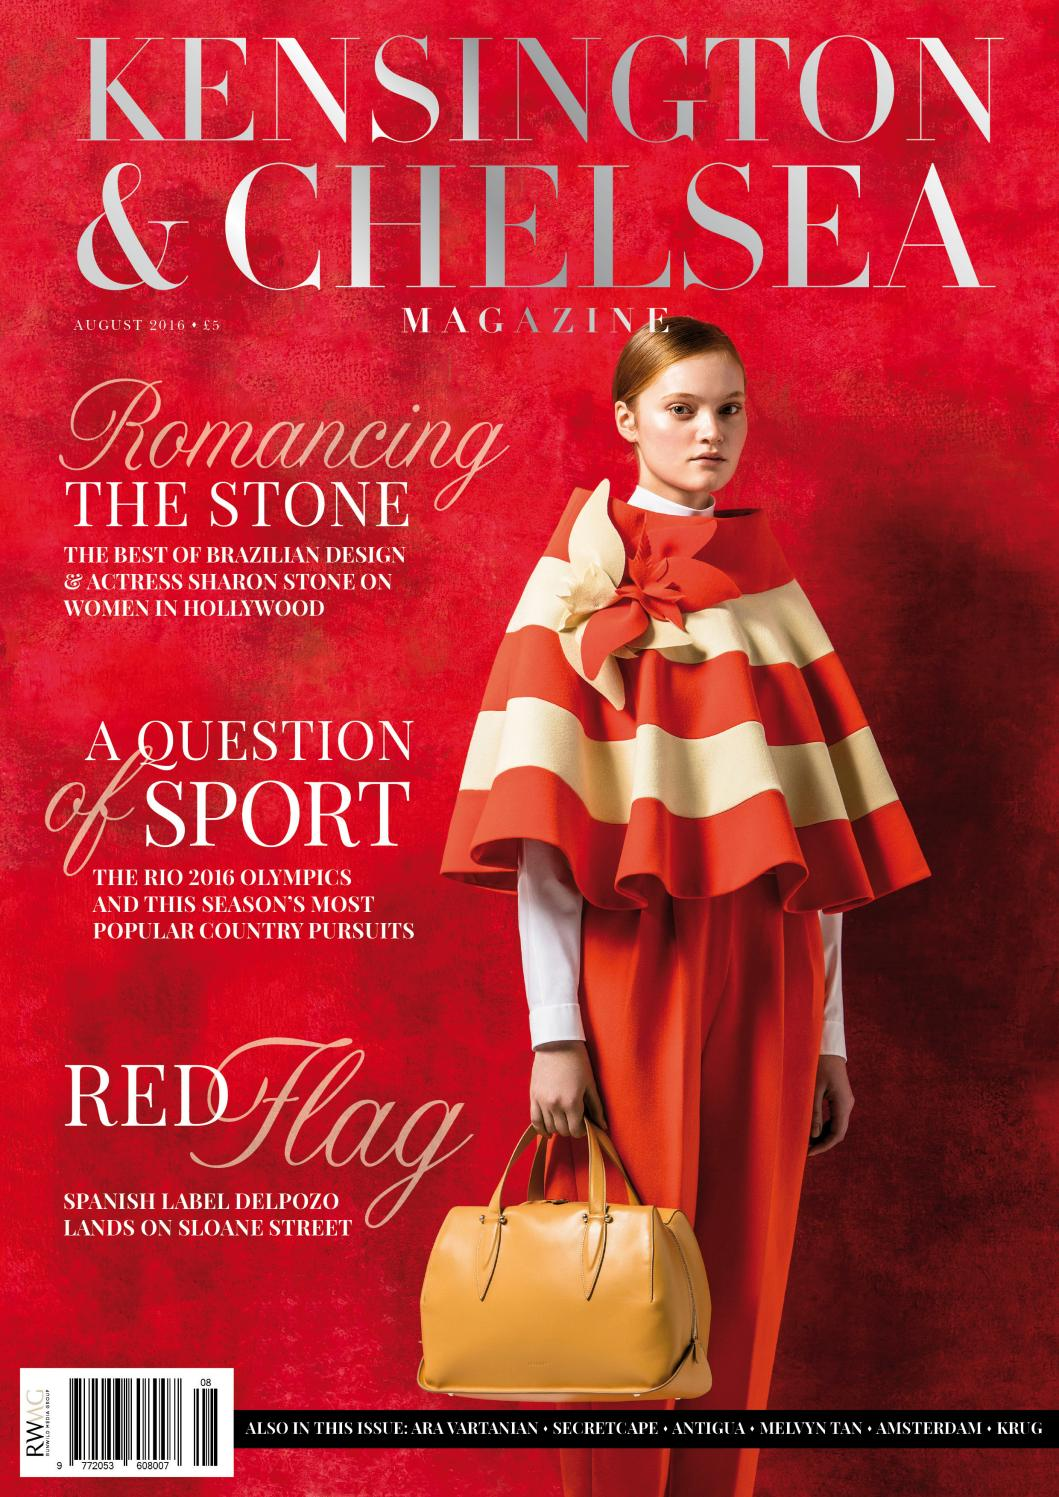 The Kensington   Chelsea Magazine August 2016 by Runwild Media Group - issuu 382b35130bfcc